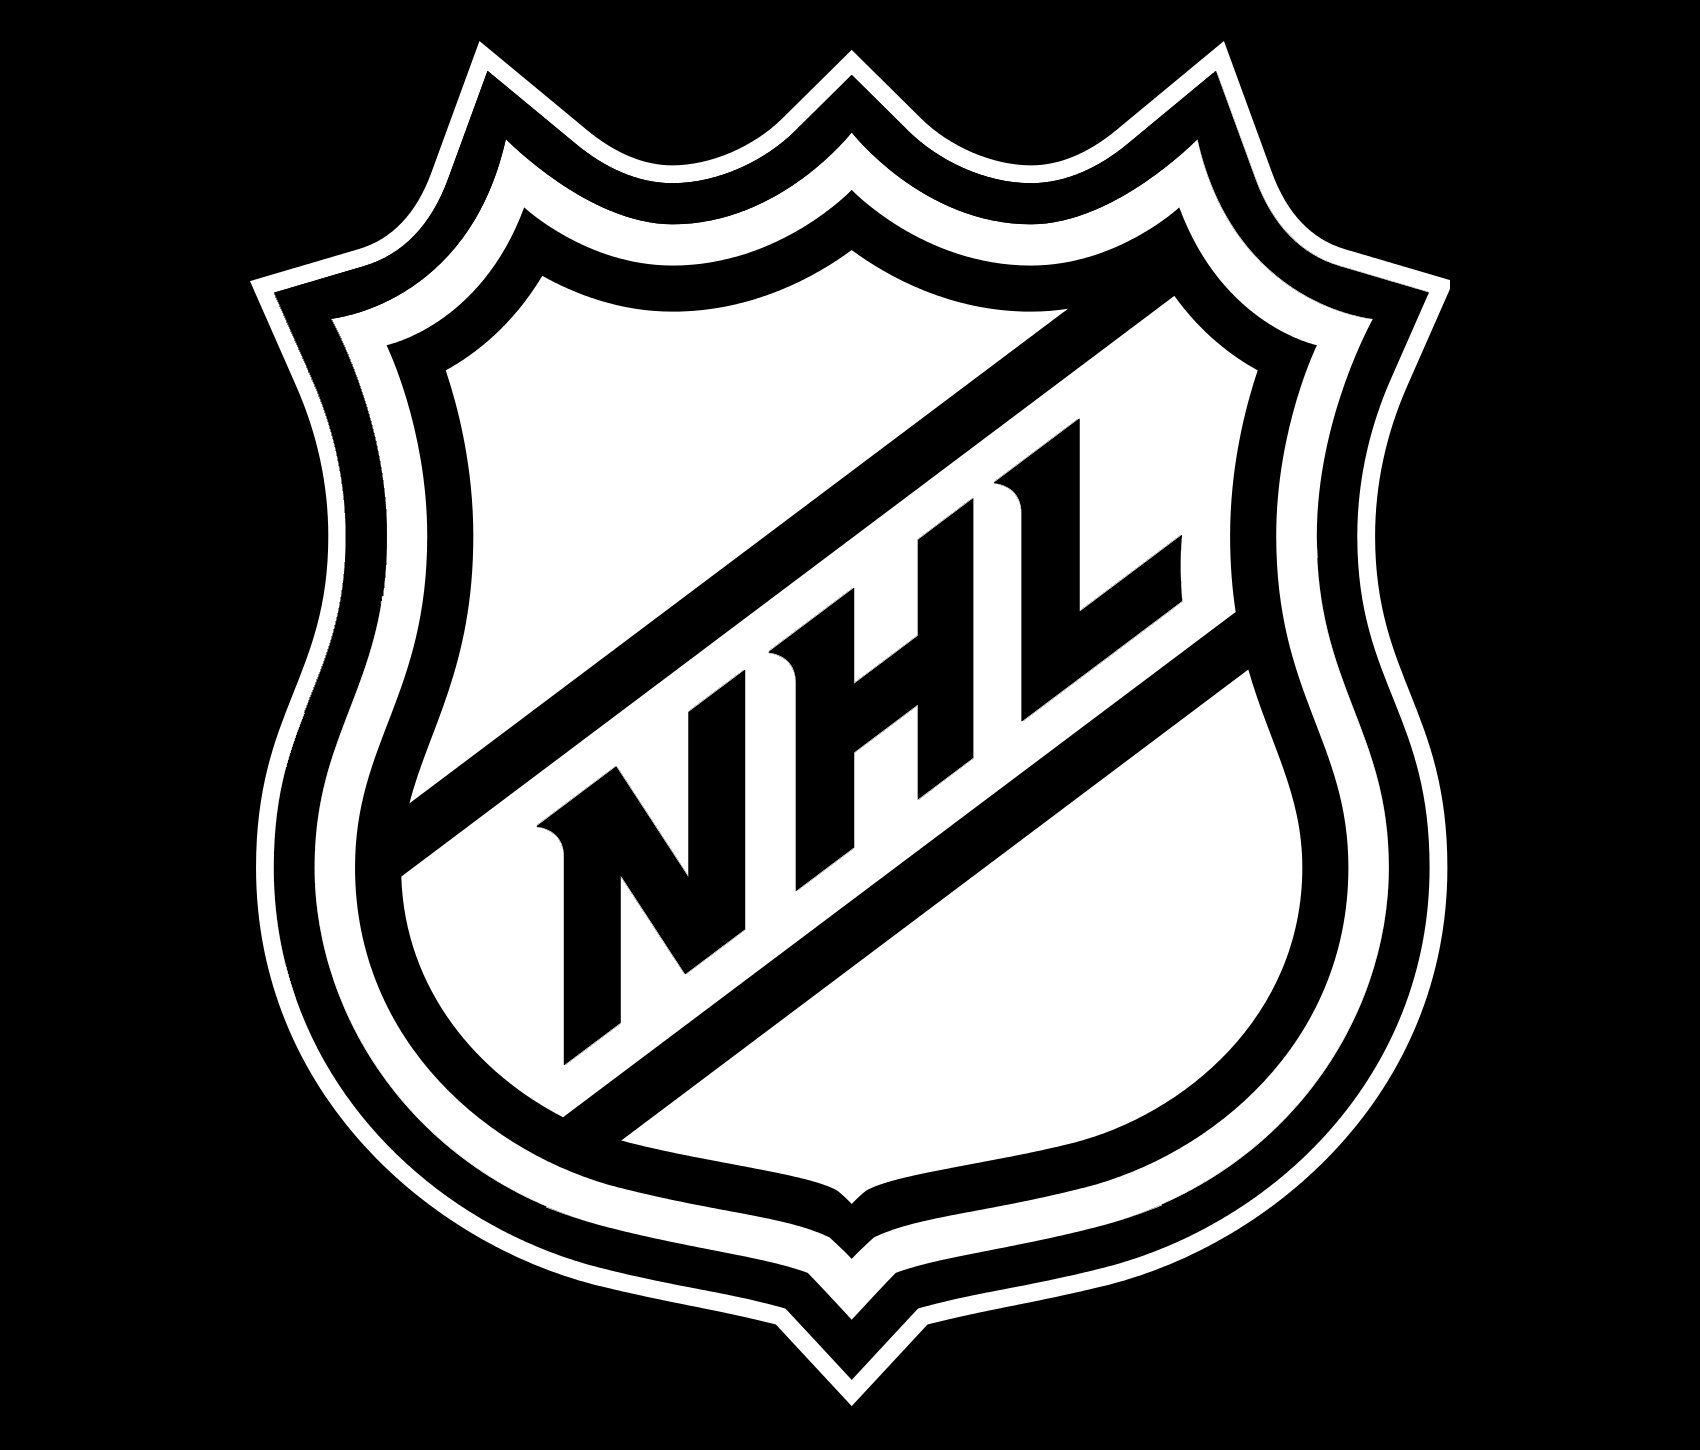 NHL Logo, National Hockey League Symbol, Meaning, History